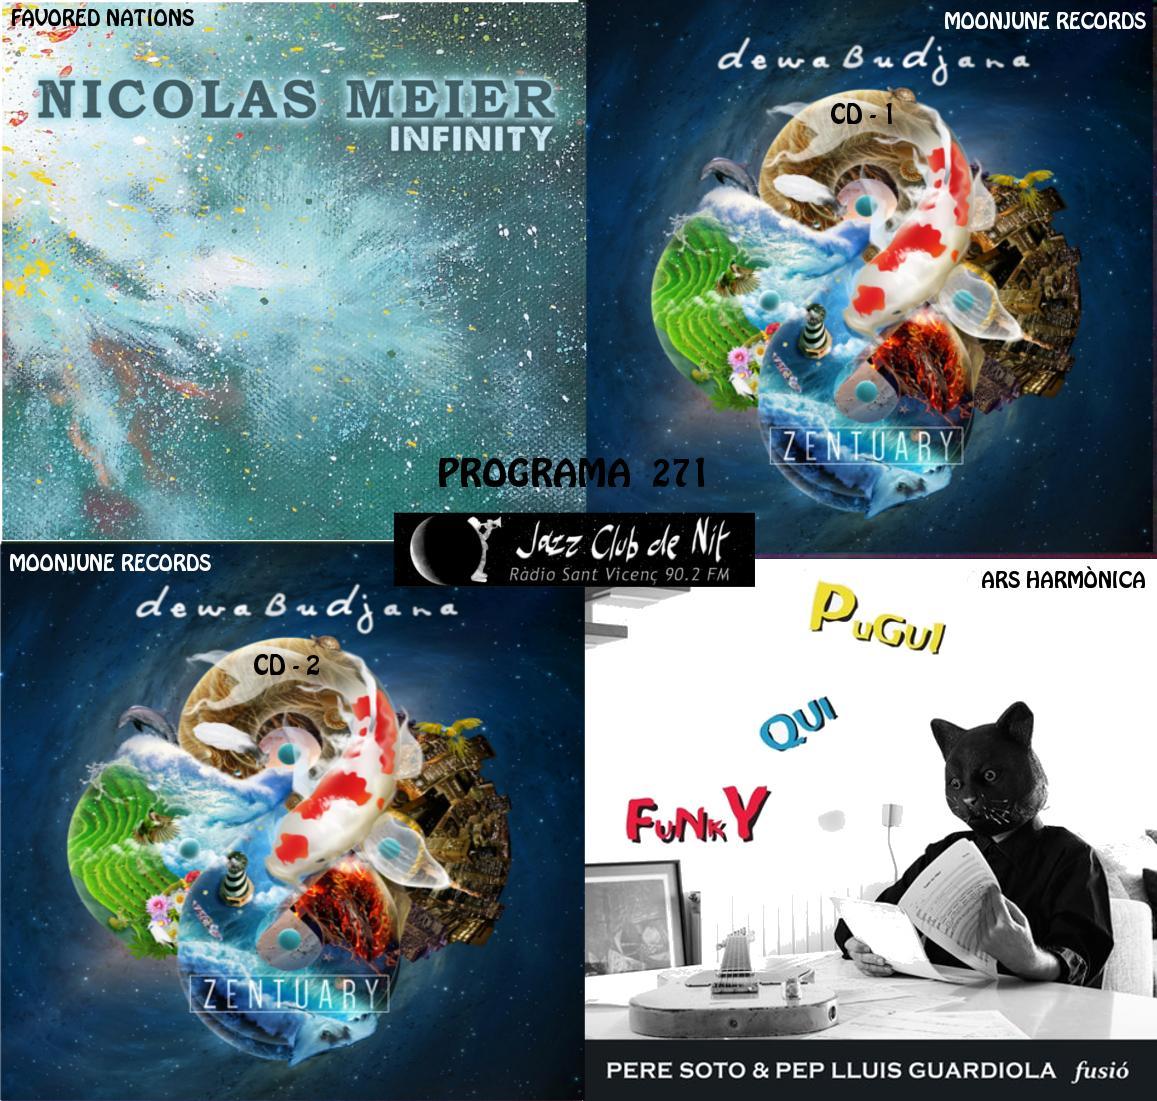 Jazz Club De Nit A Radio Sant Vicenc 90 2 Fm Programa 271 Nicolas